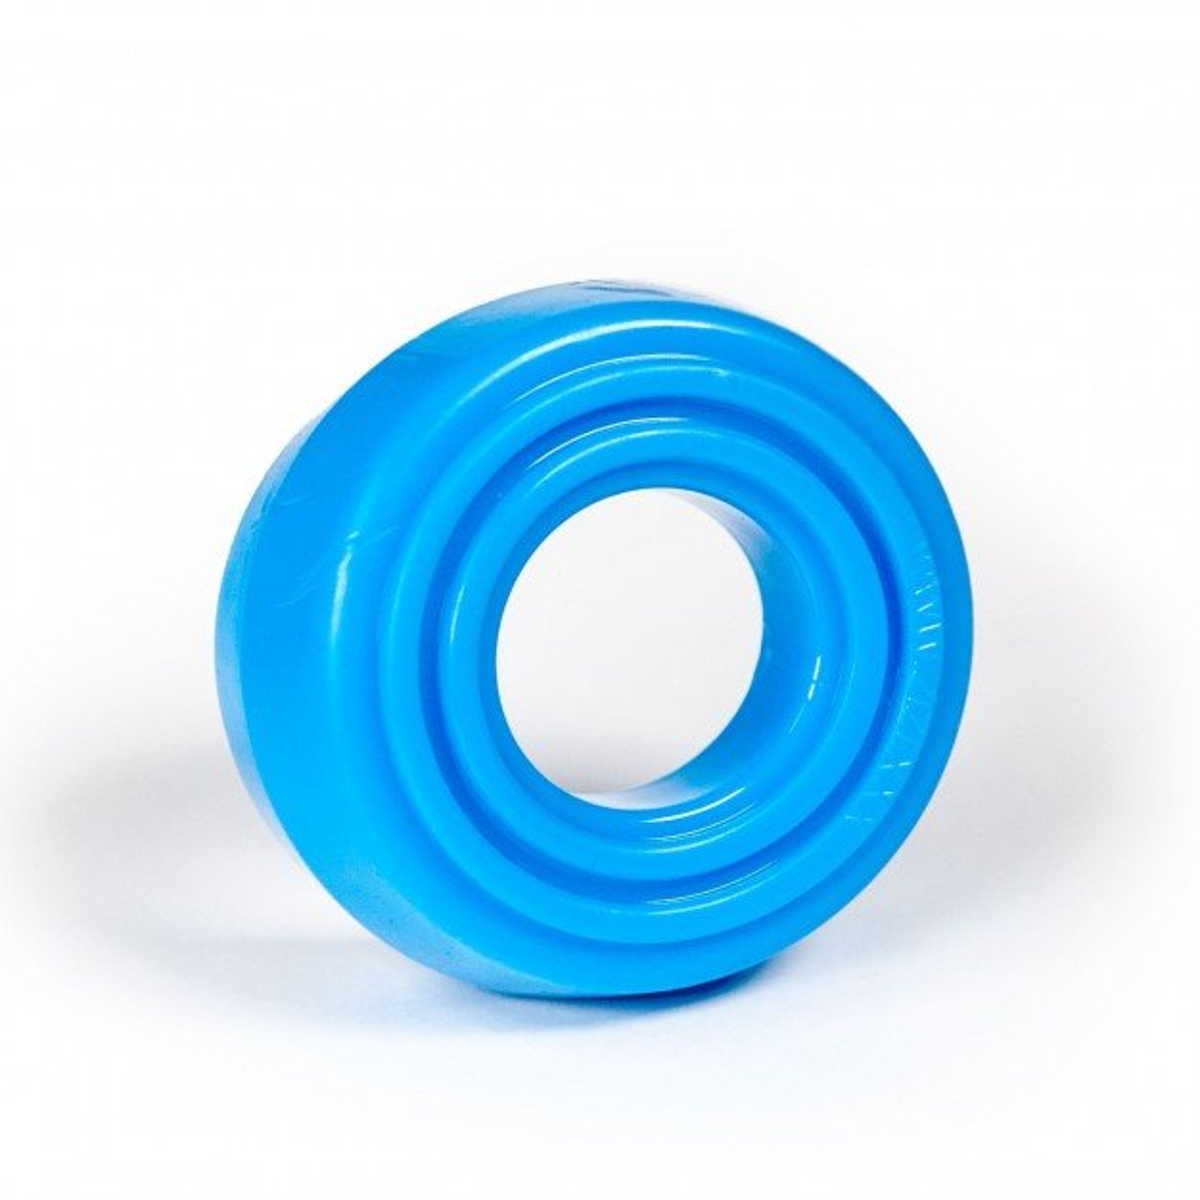 Zizi Accelerator Cock Ring Fluo Blue